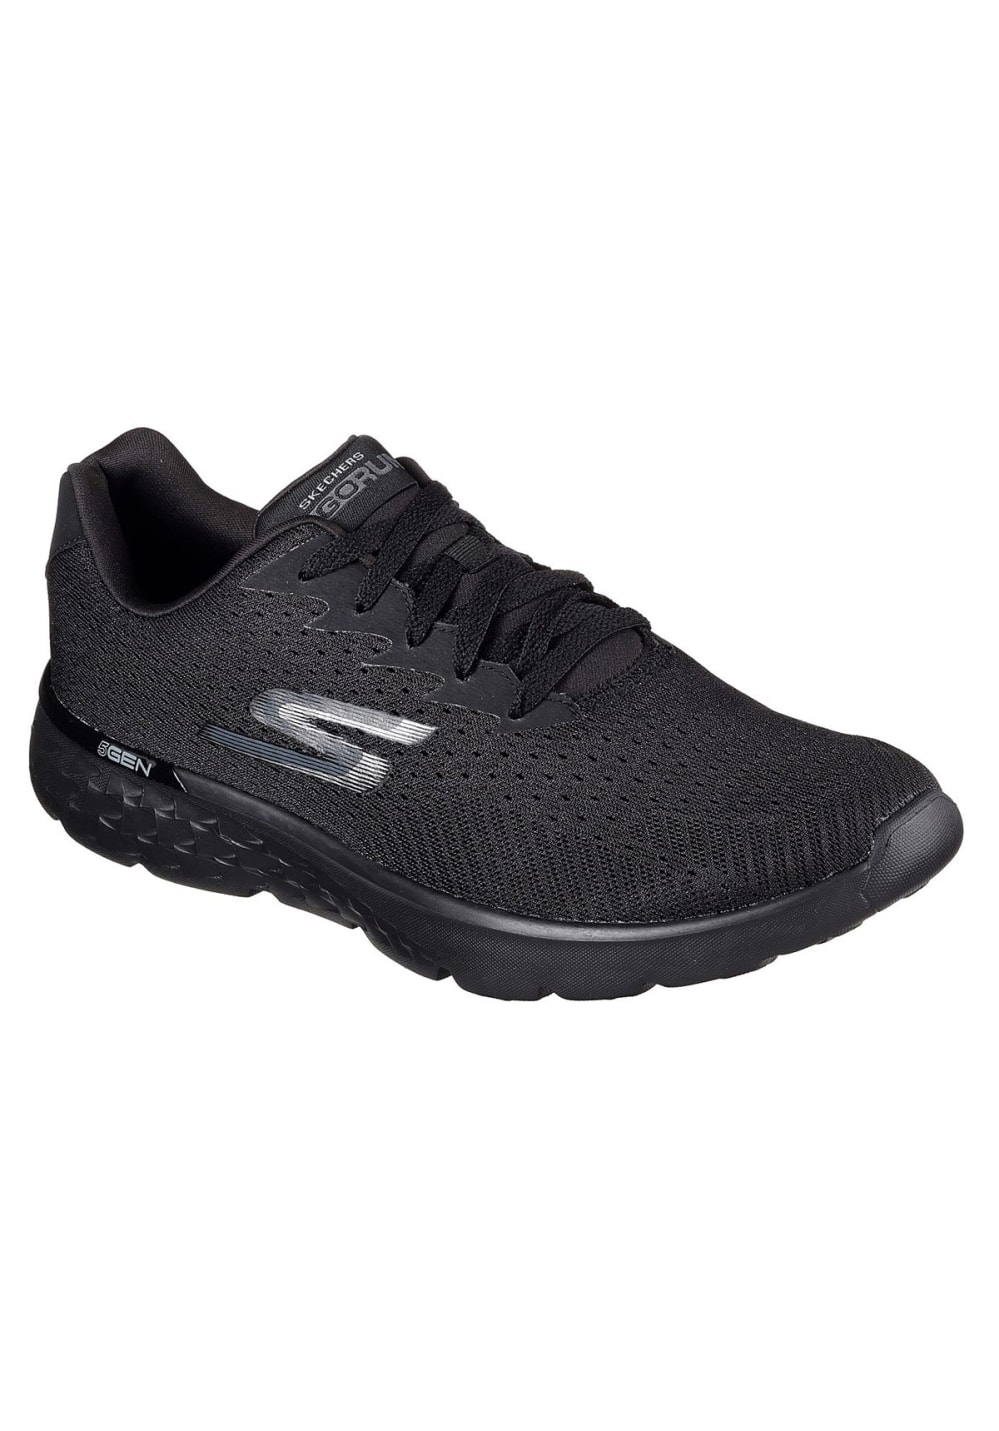 Skechers Go Run 400 Generate Running Shoes For Men